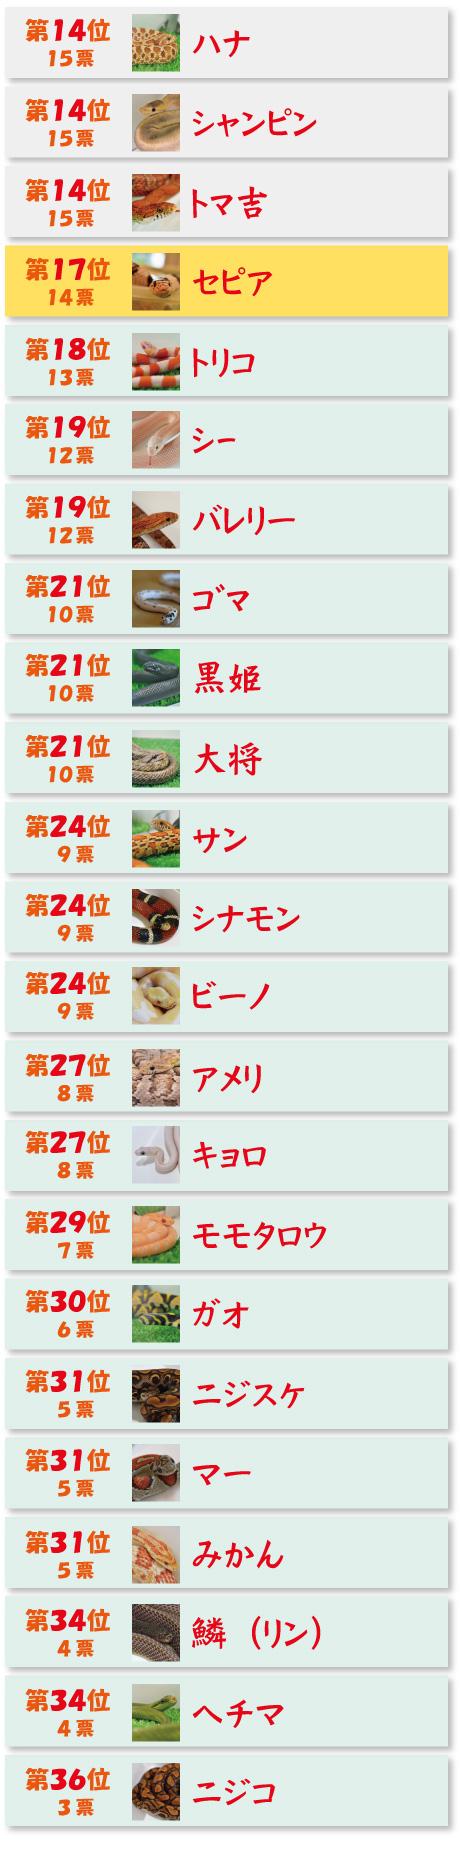 web_senkyo_chukan11-36